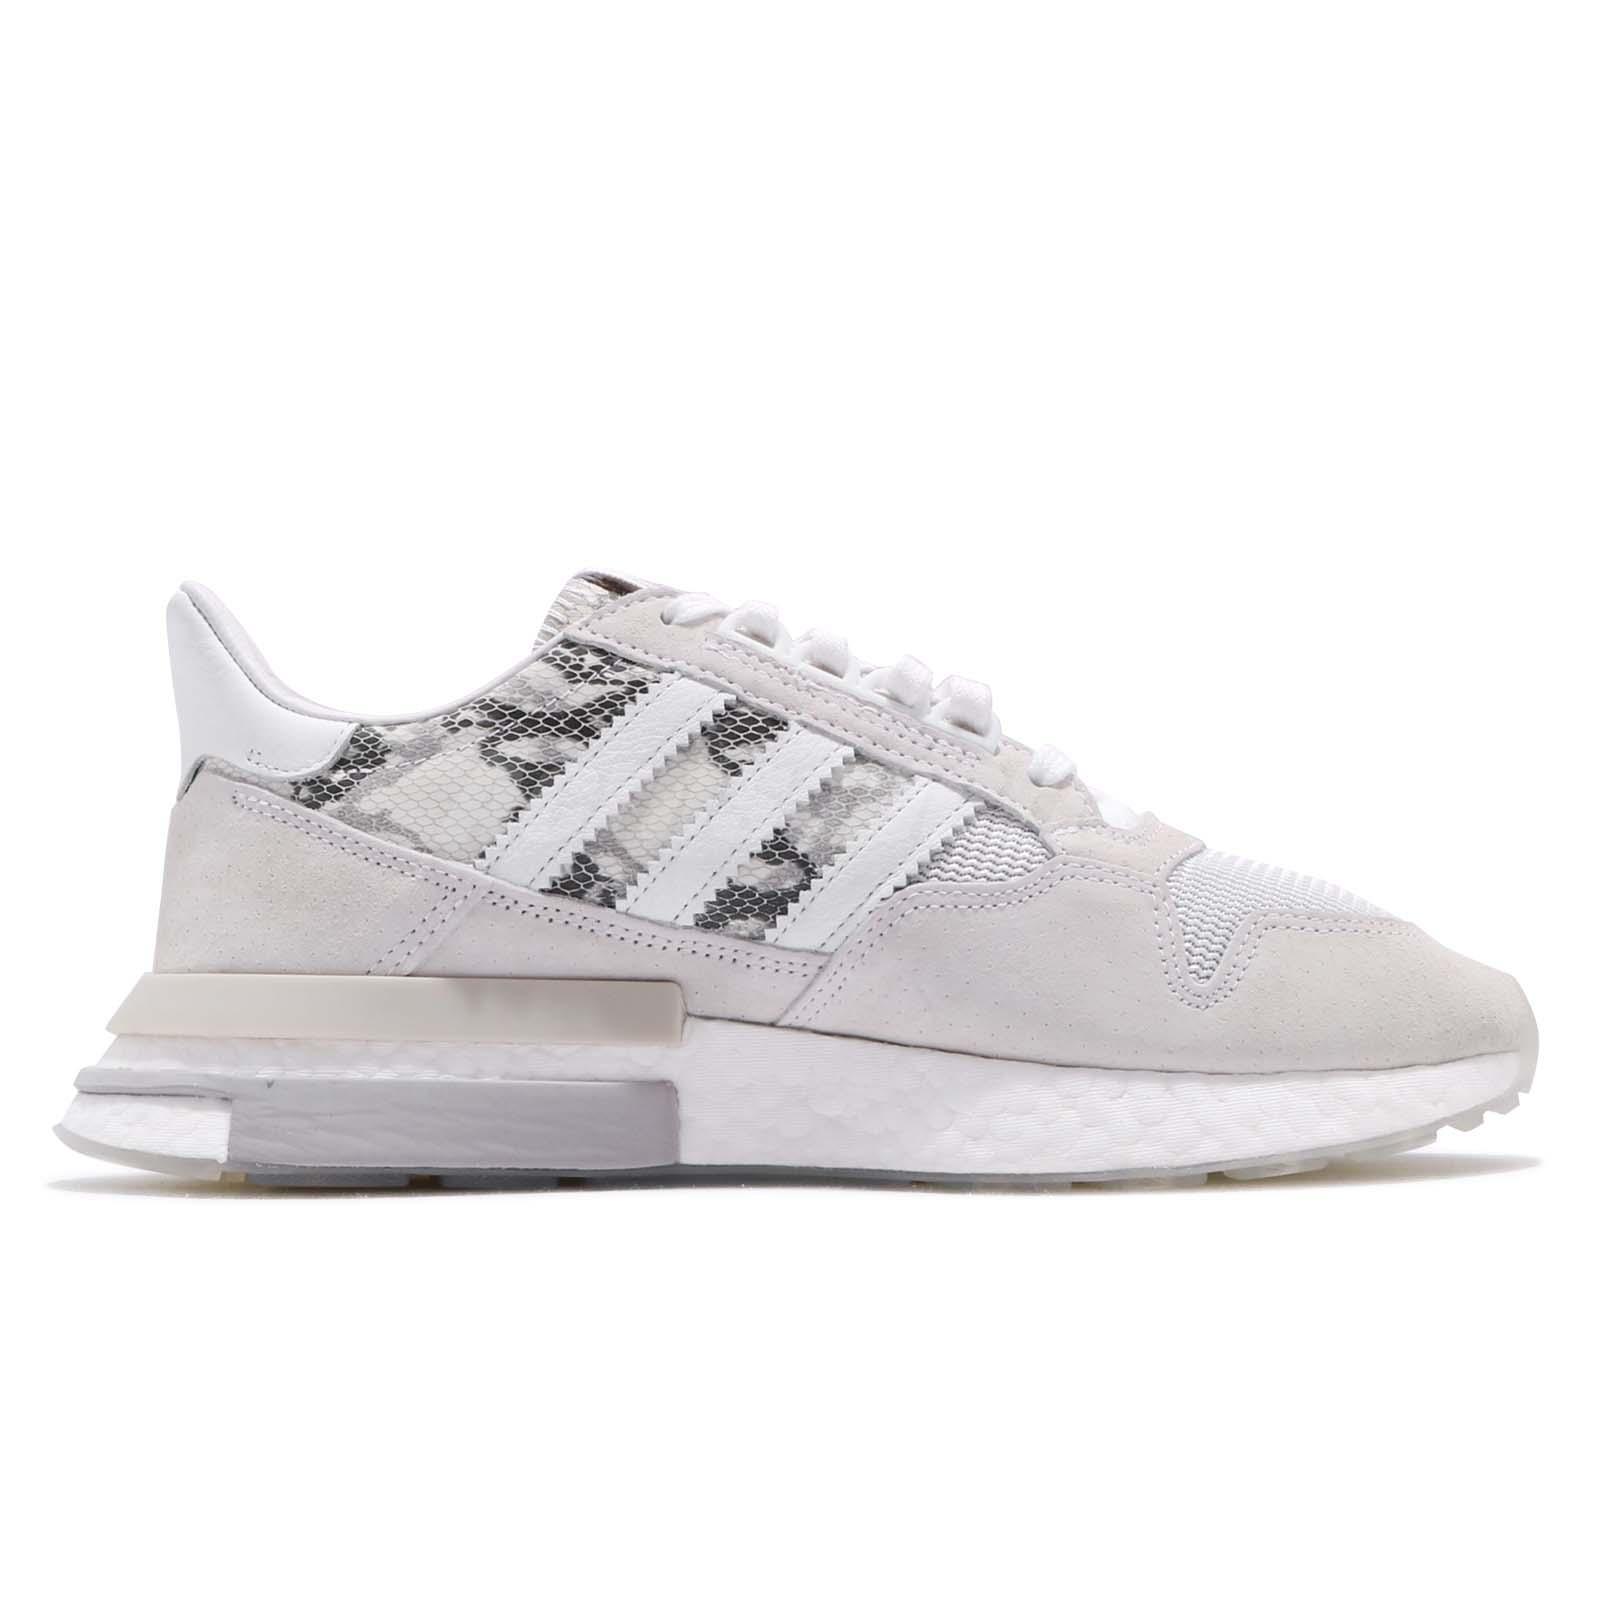 53f0f565e44ef adidas Originals ZX 500 RM White Grey Men Running Casual Shoes ...